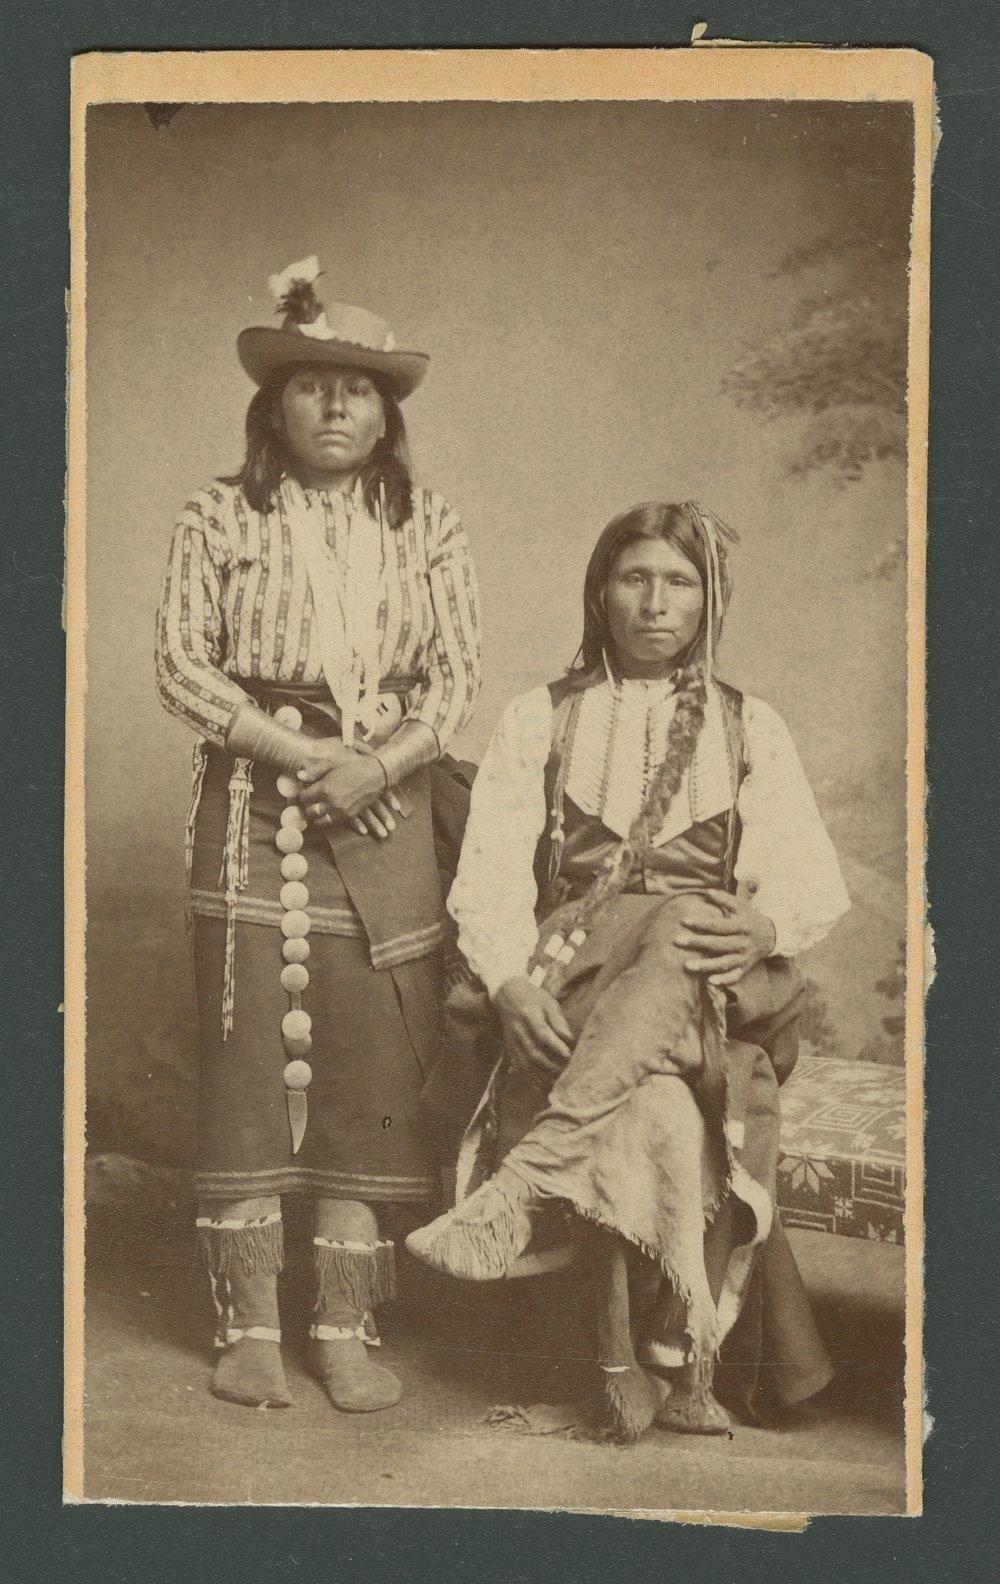 Kichai man and woman, in Indian Territory - 1